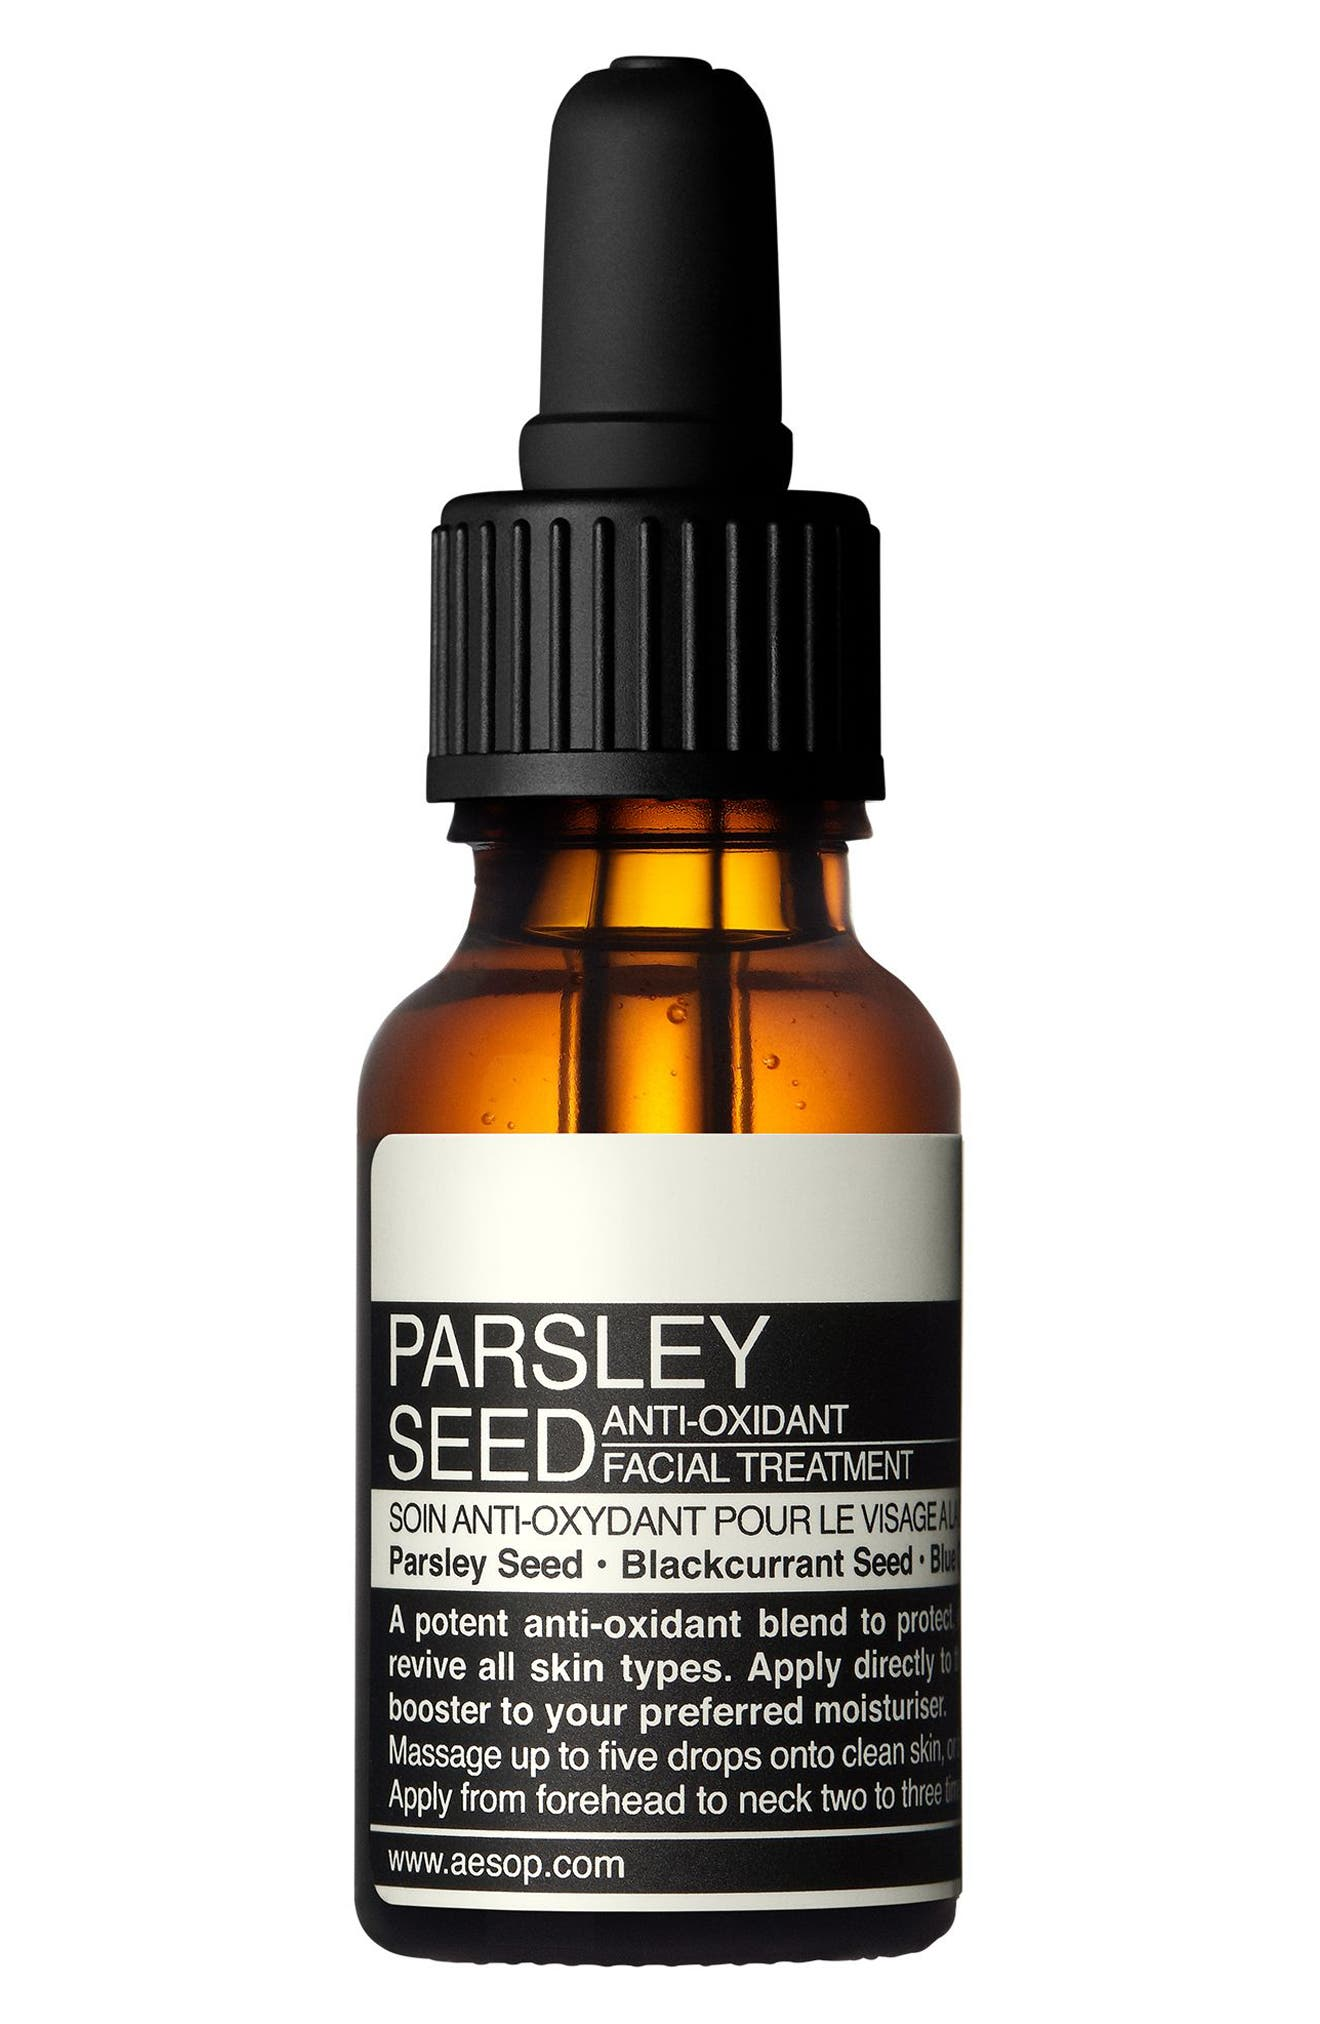 Parsley Seed Anti-Oxidant Facial Treatment